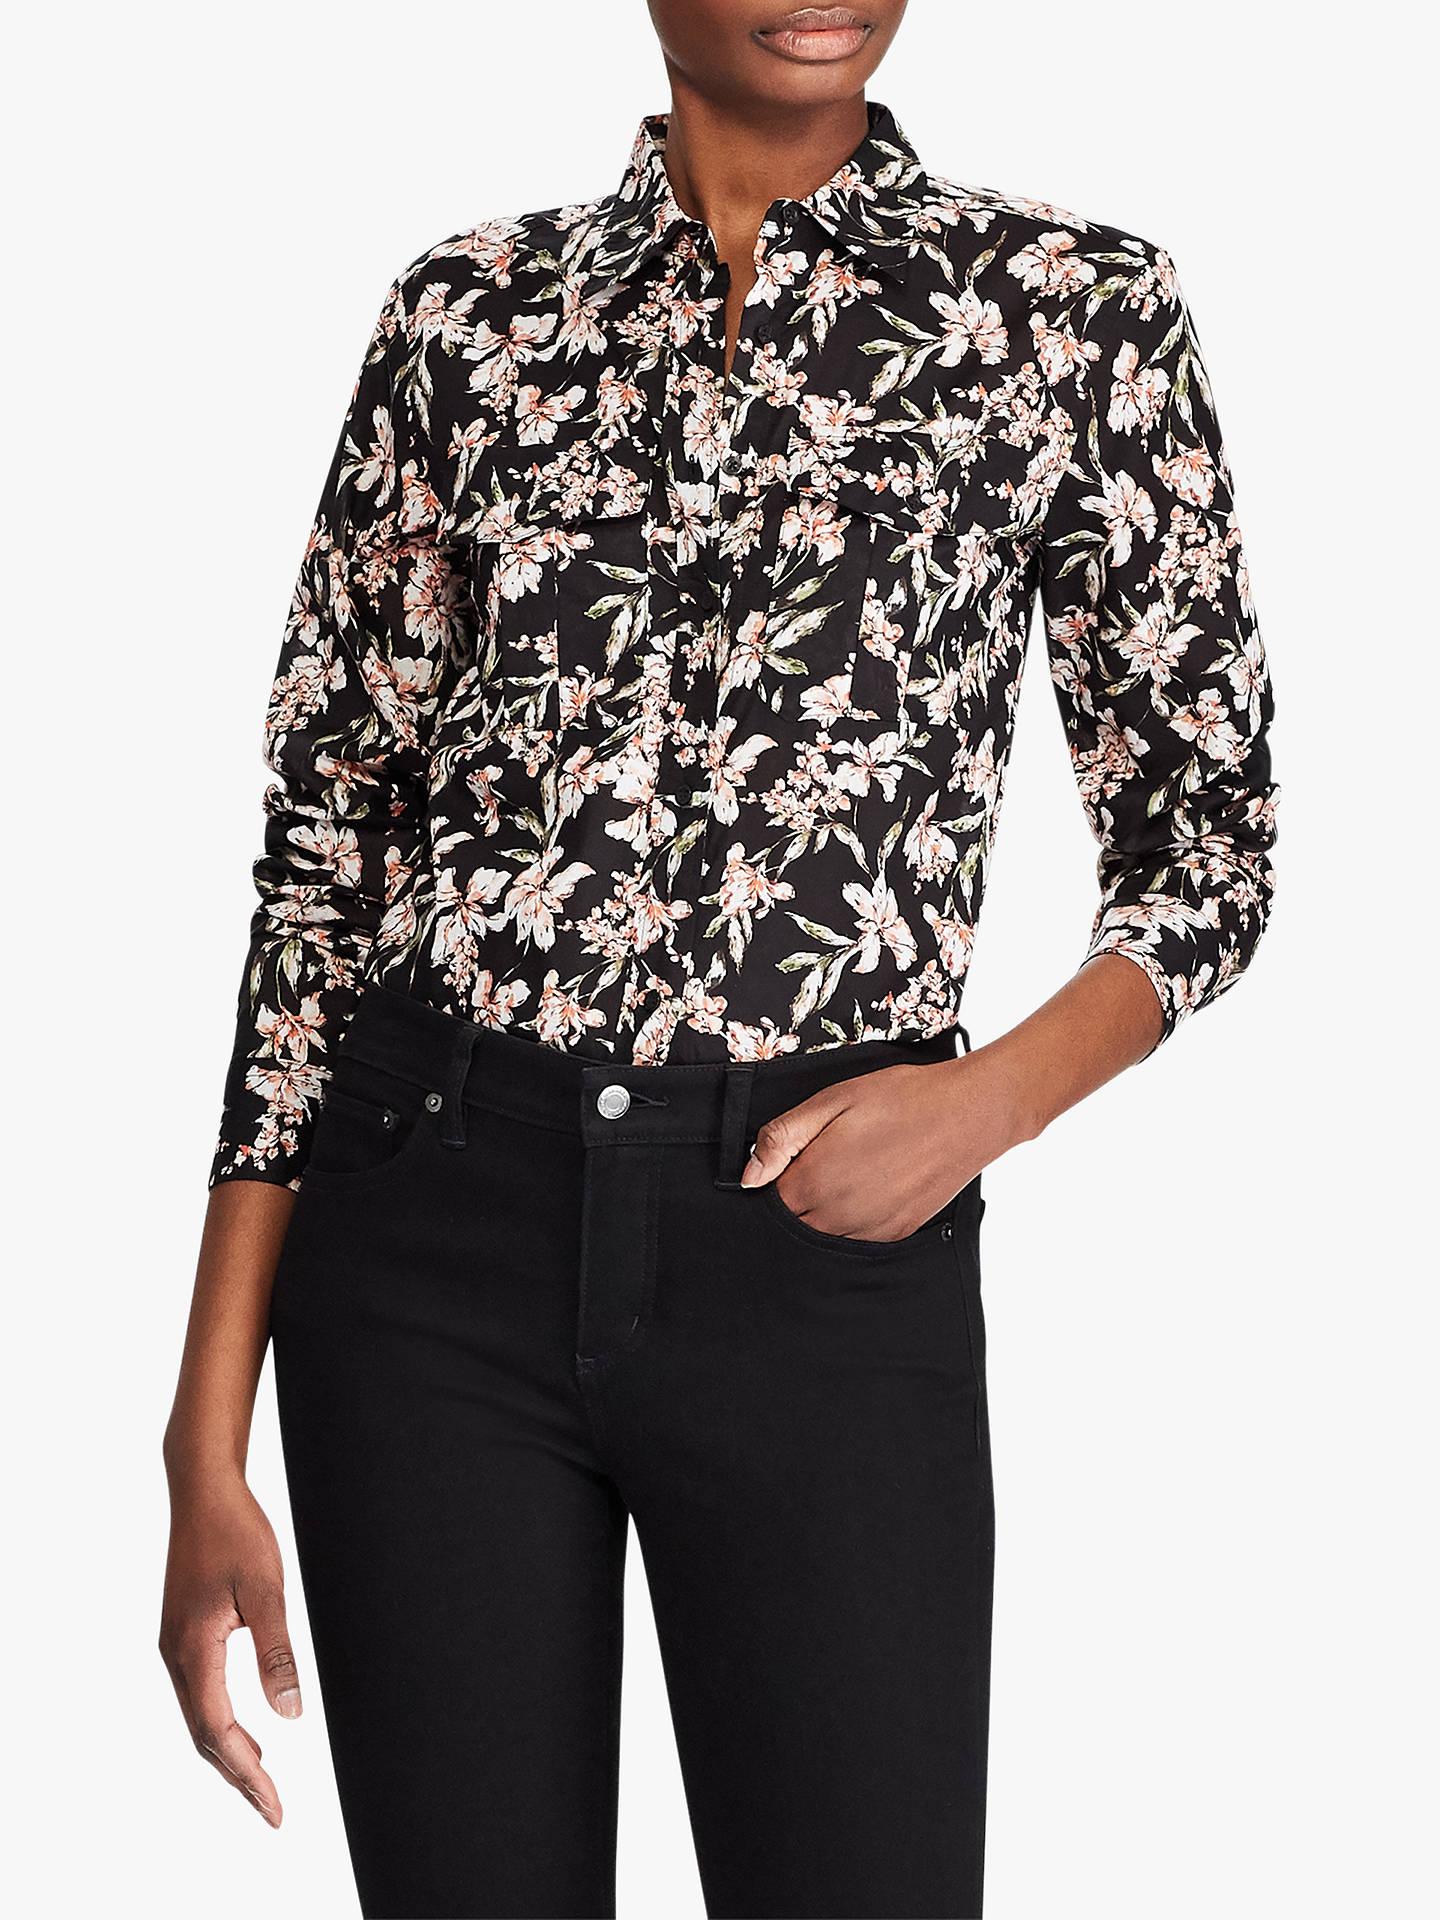 d9992526679 Lauren Ralph Lauren Courtenay Floral Print Shirt, Polo Black